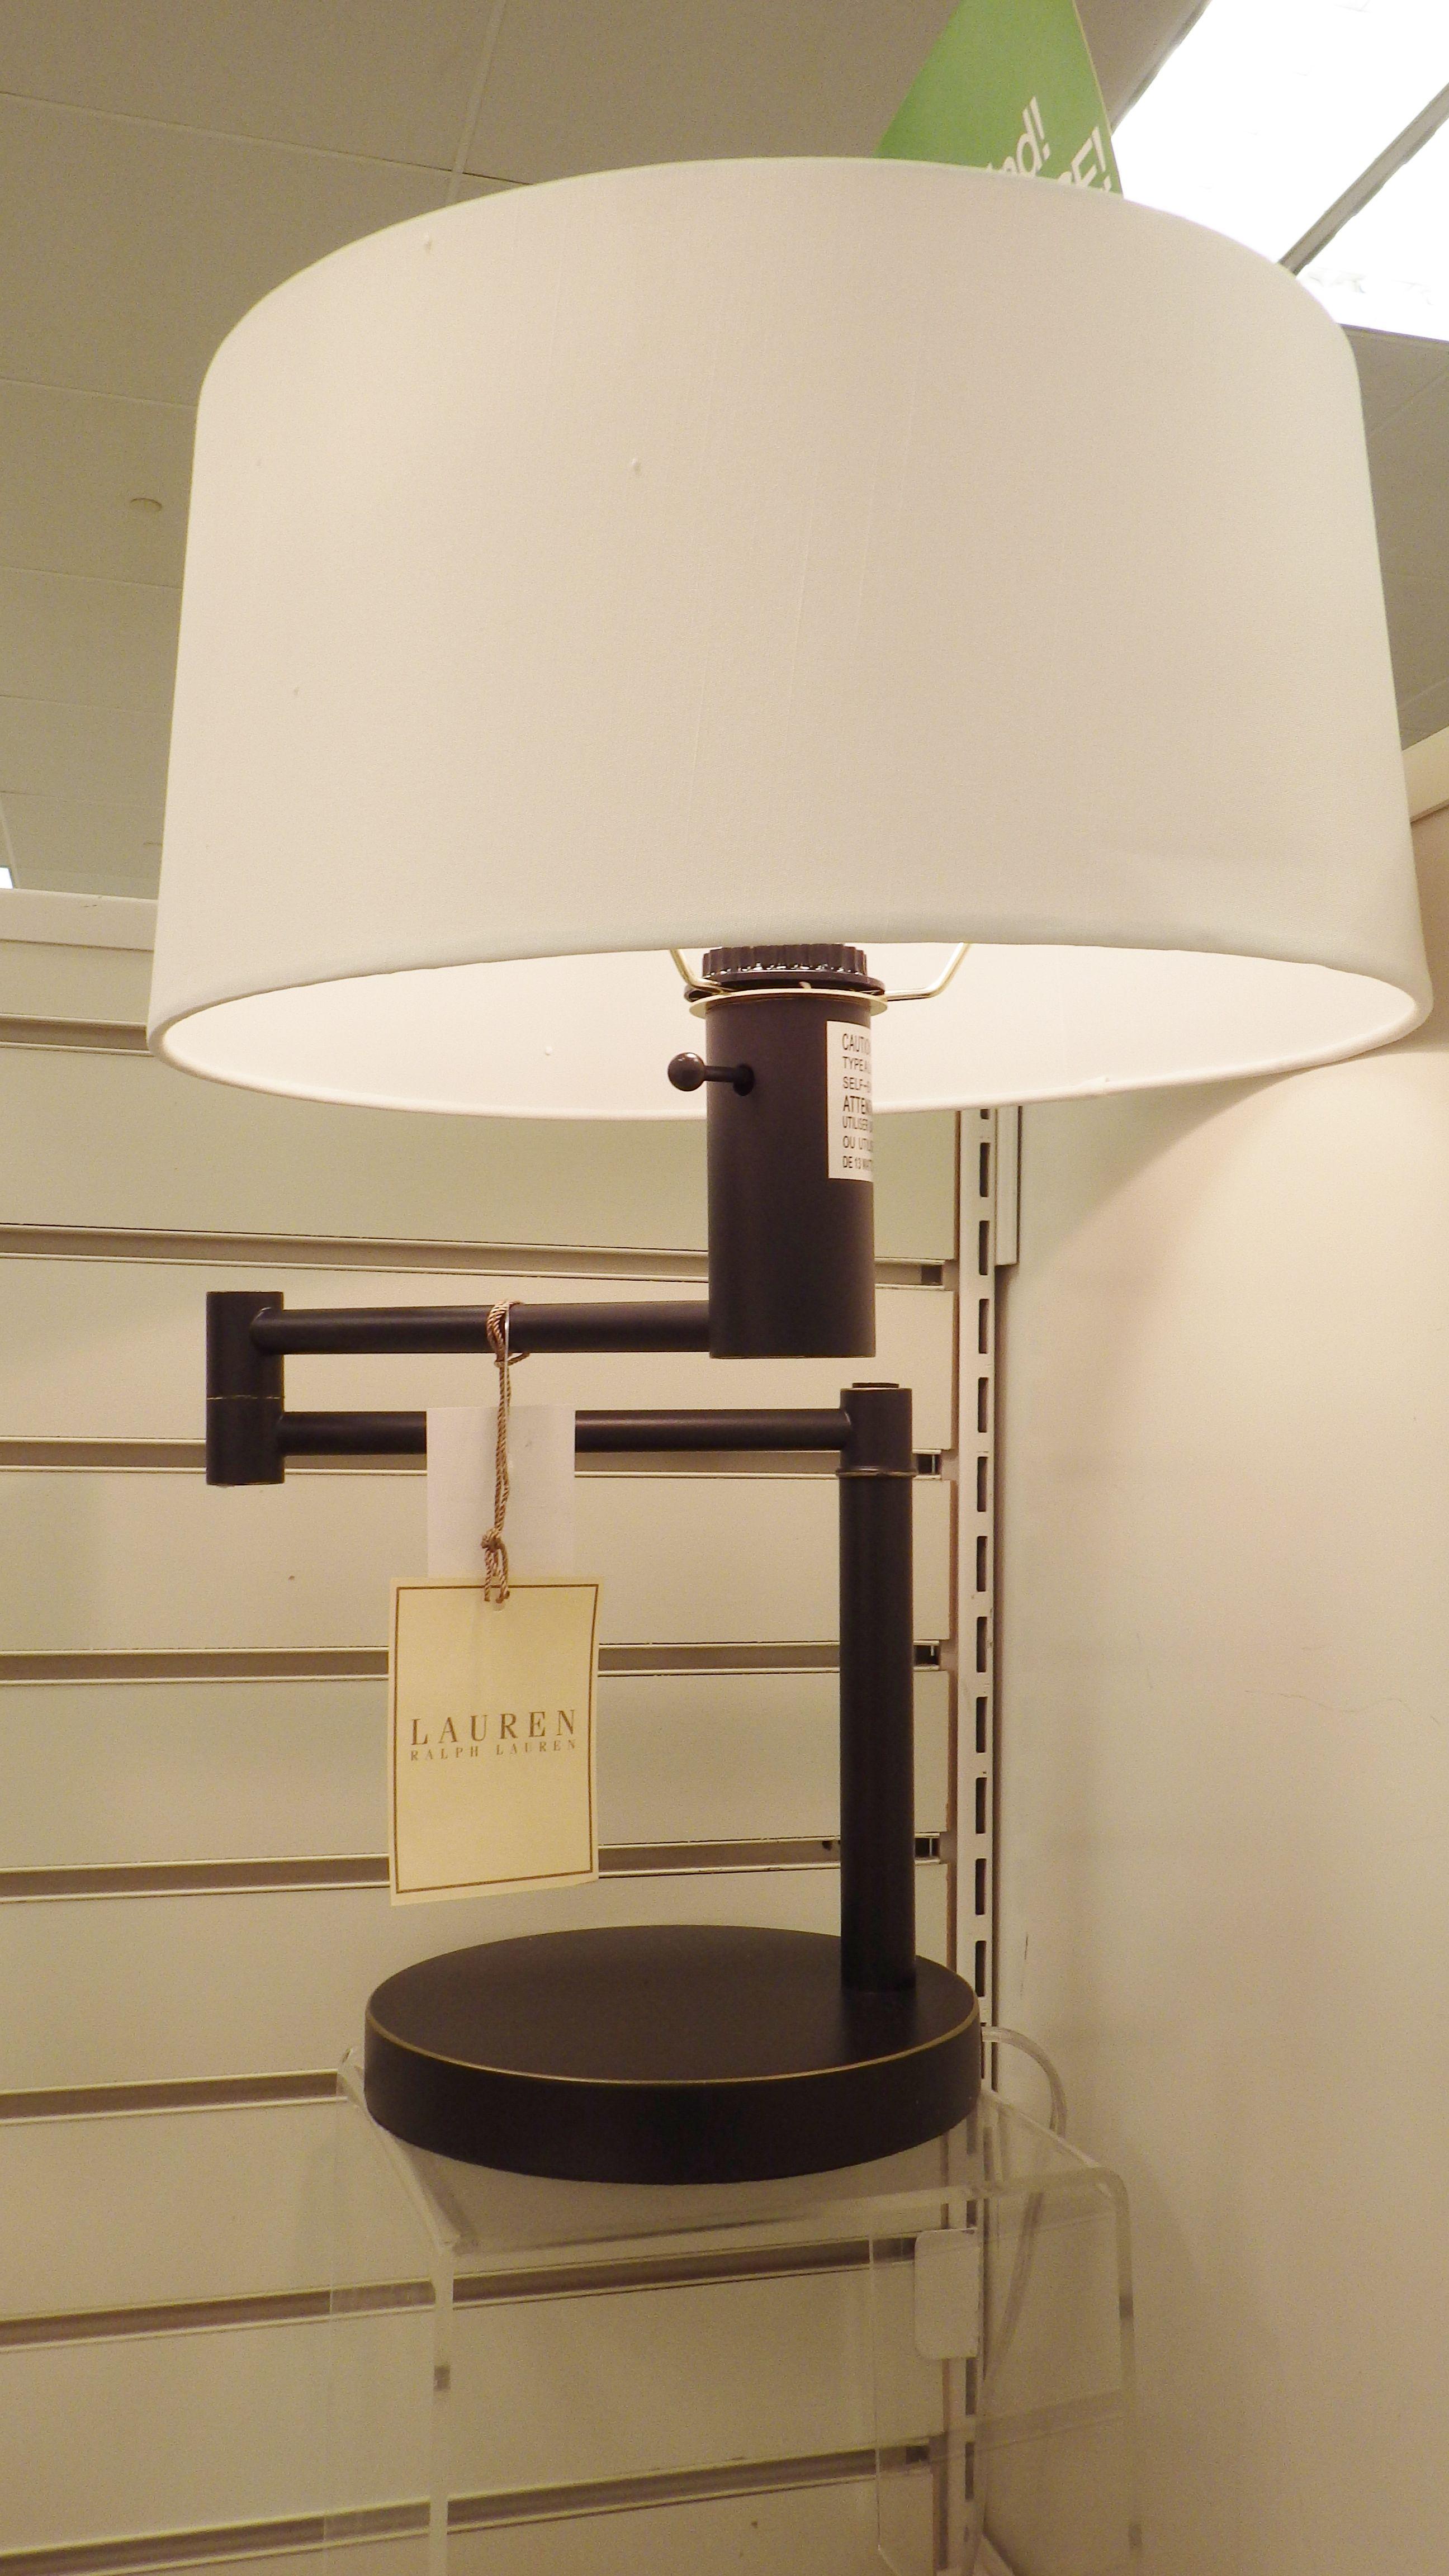 Homegoods Ralph Lauren lamp 60 Lighting Pinterest